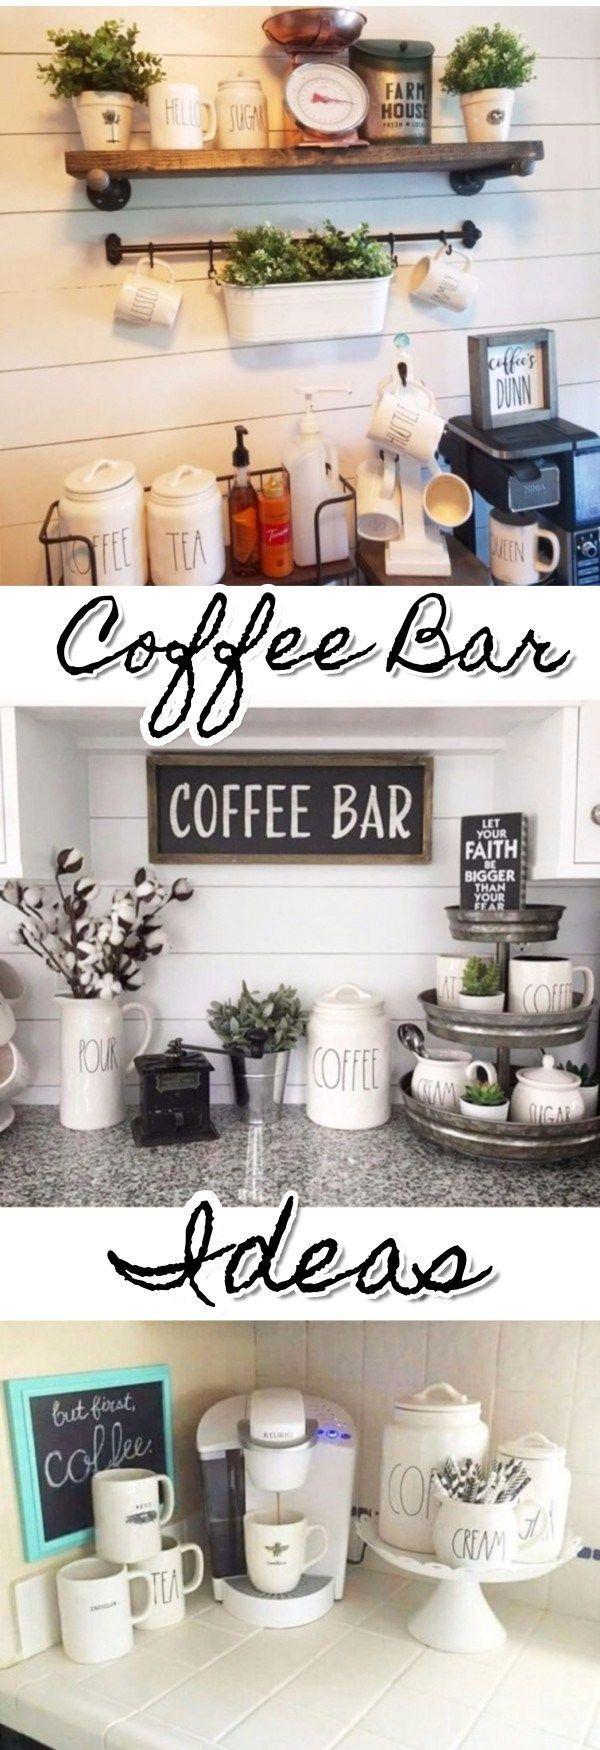 DIY Coffee Bar Ideas - Stunning Farmhouse Style Beverage ...